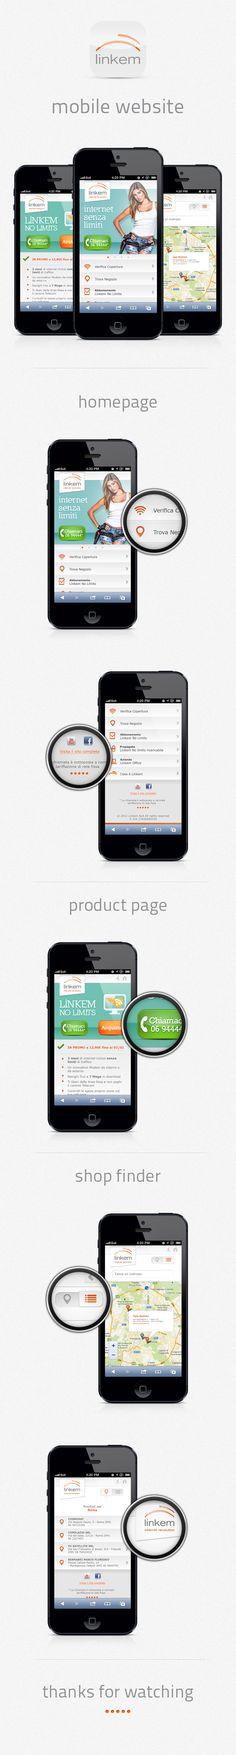 Linkem Mobile #Website by Davide Baratta, via #Behance #Mobile    ----BTW, Please Visit:  http://artcaffeine.imobileappsys.com